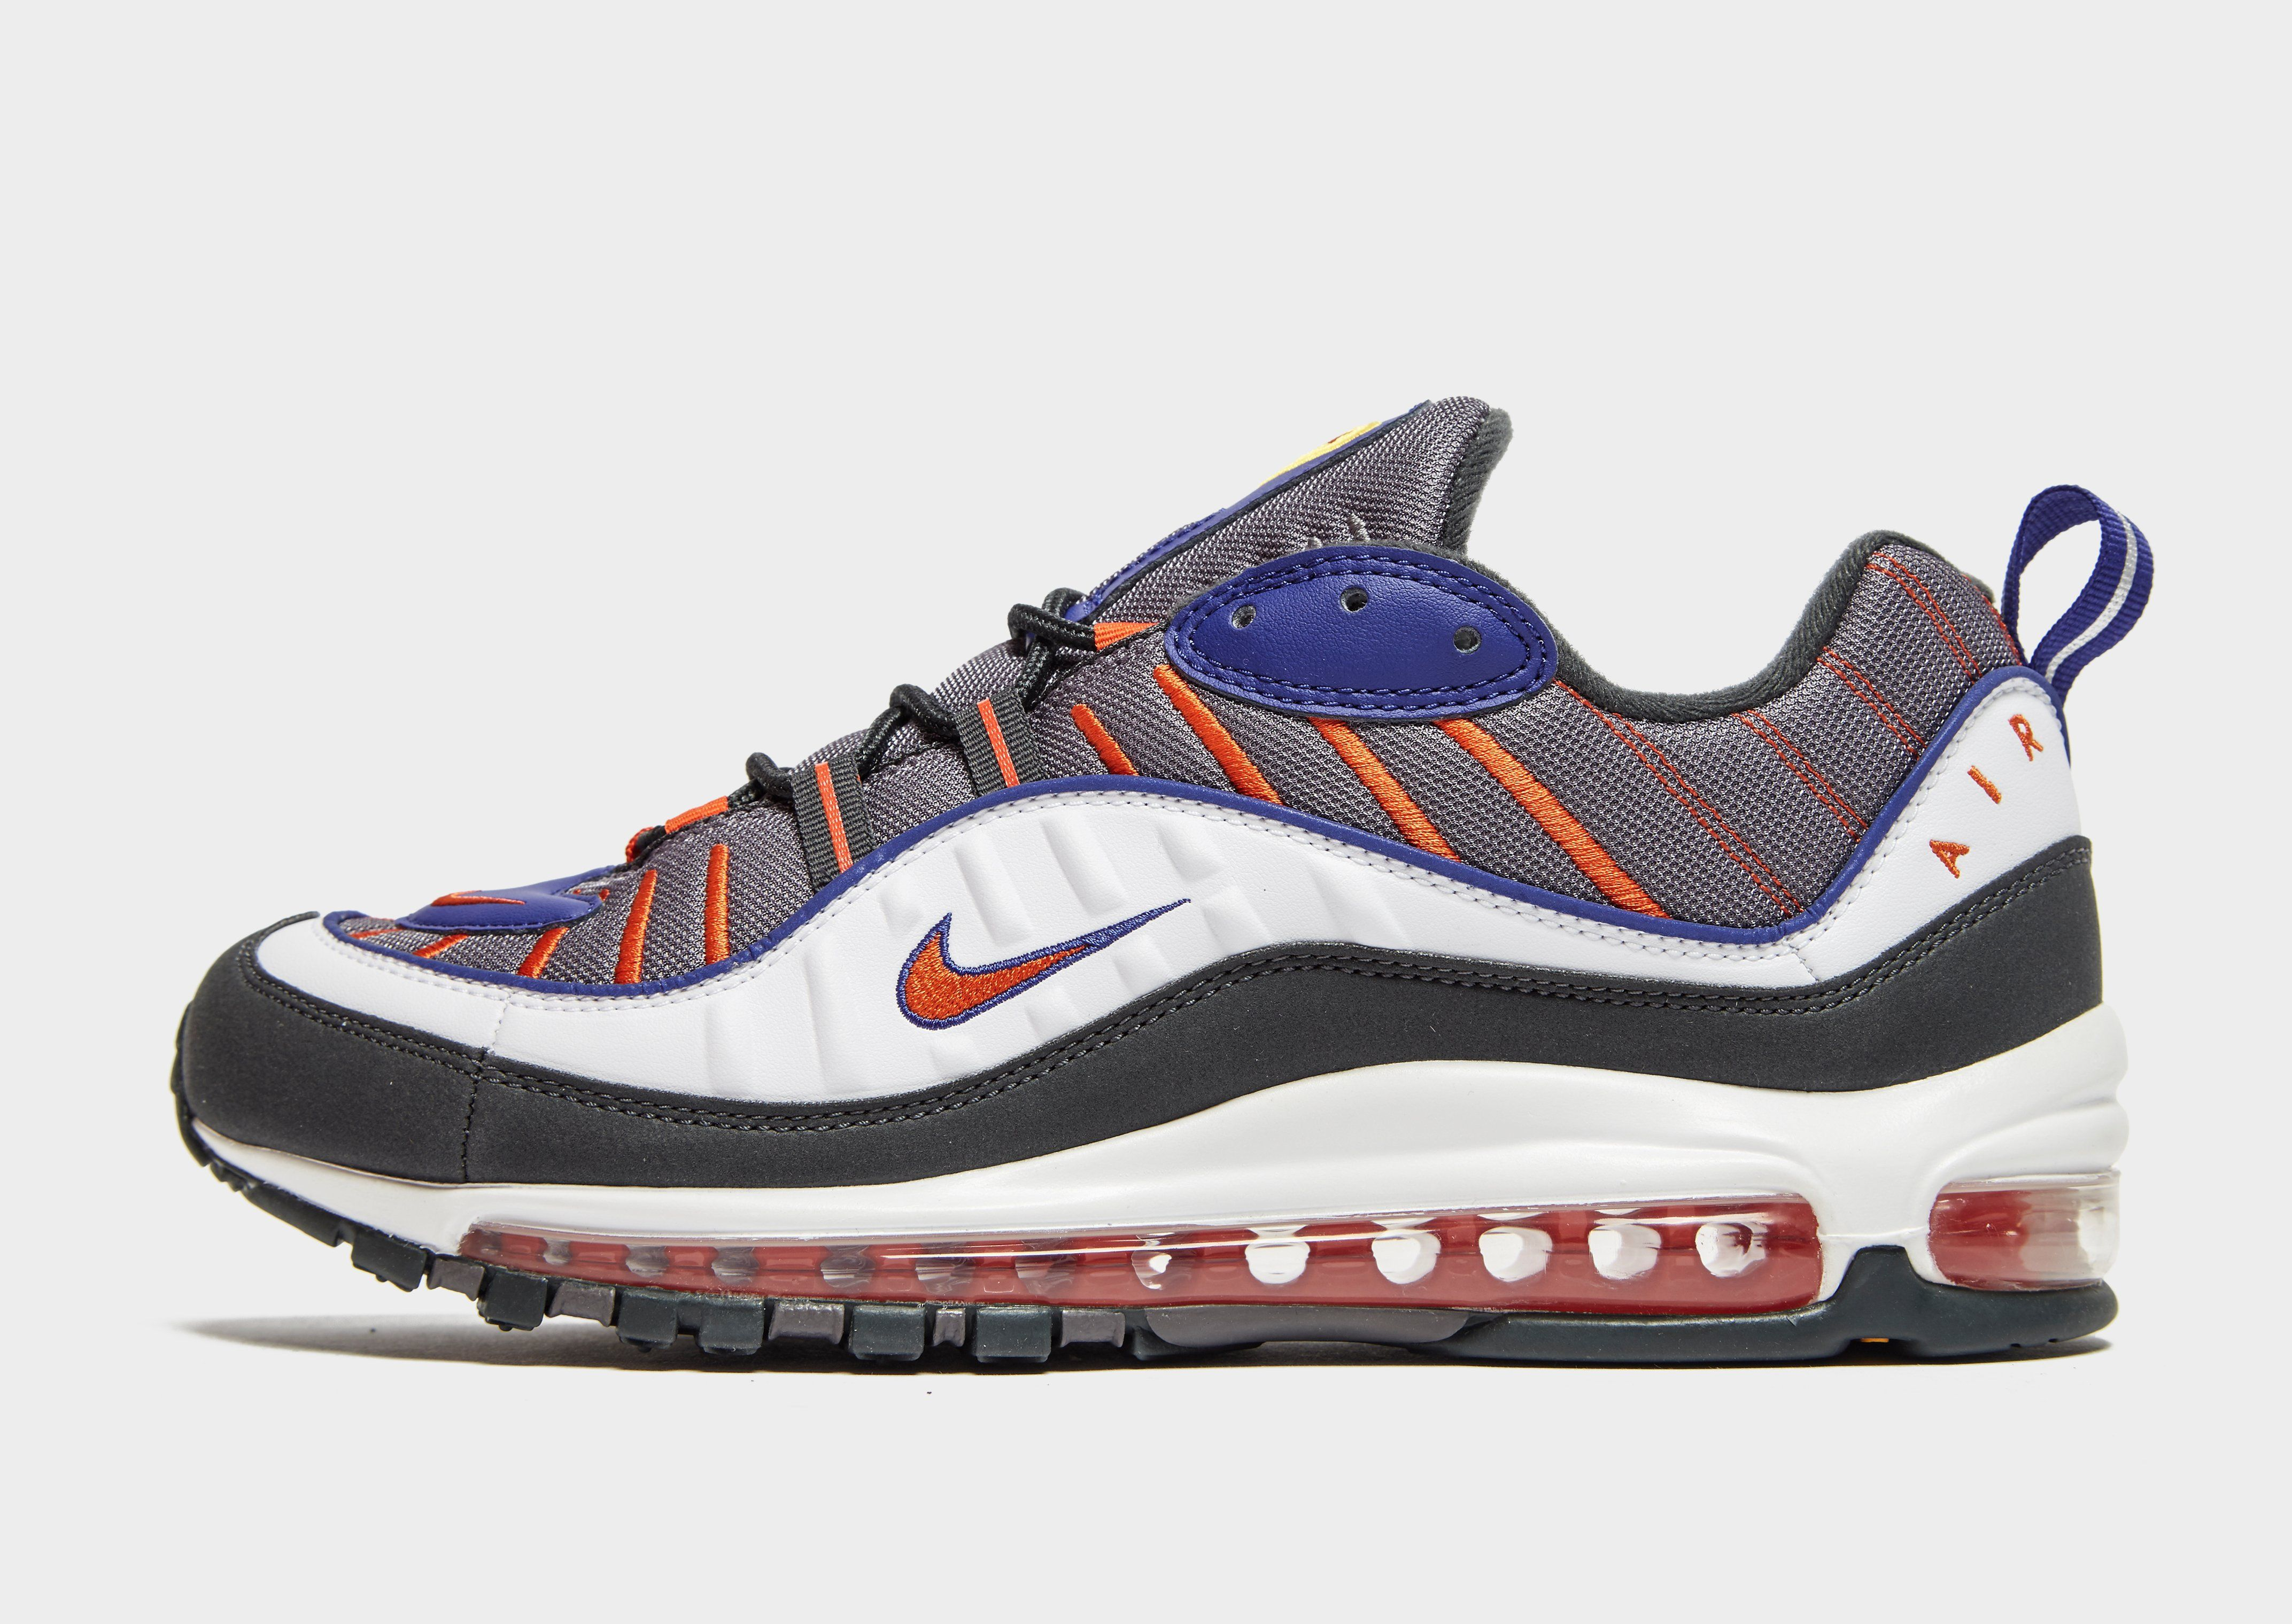 premium selection 49b8a 4bbe3 Nike Air Max 98 SE